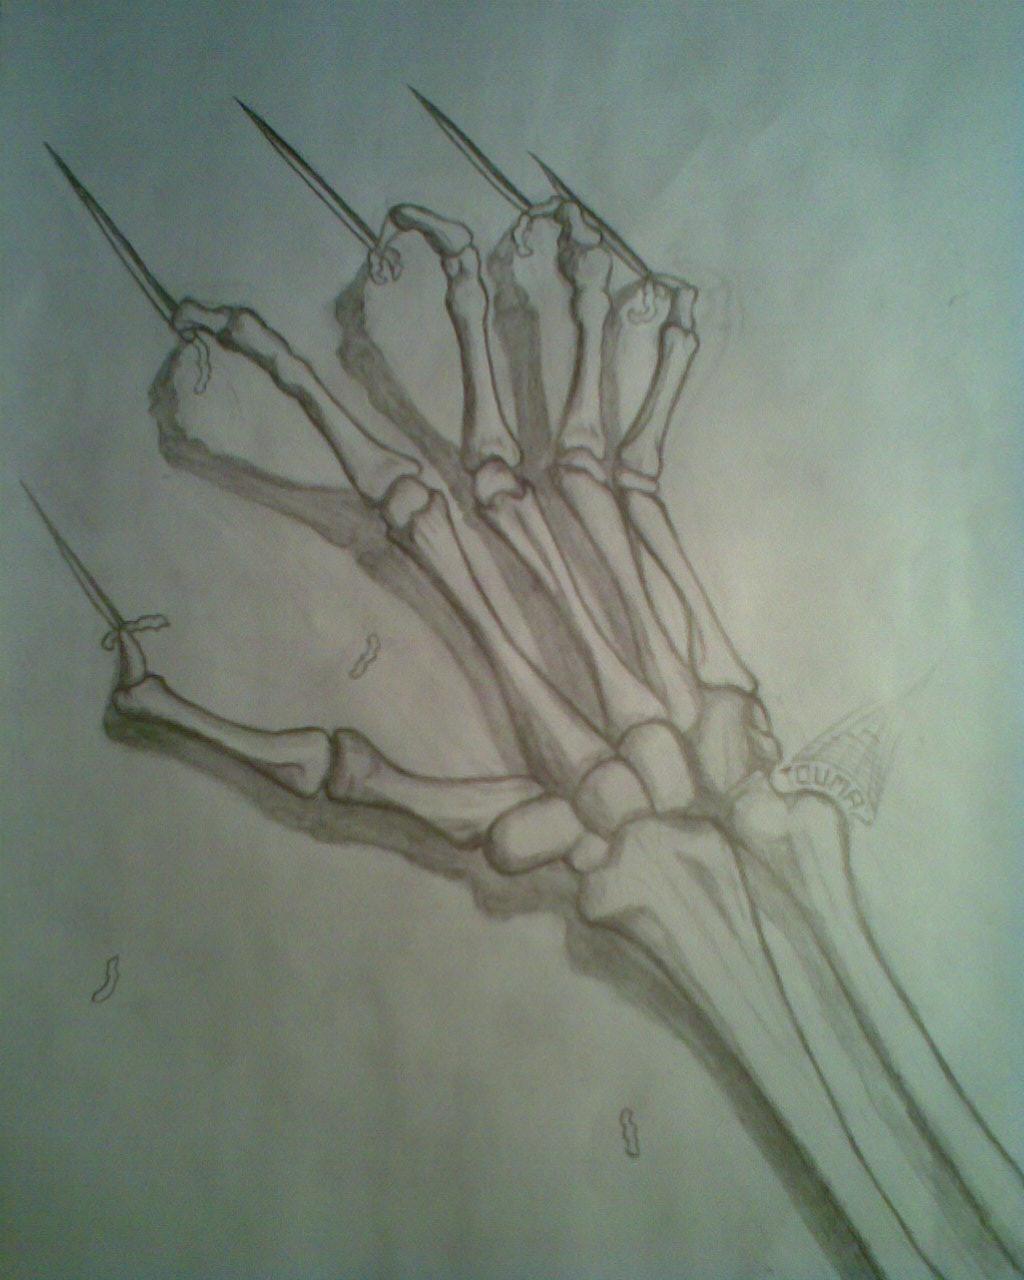 Drawn sleleton hand drawn 2011 Drawing © Drawing Hand